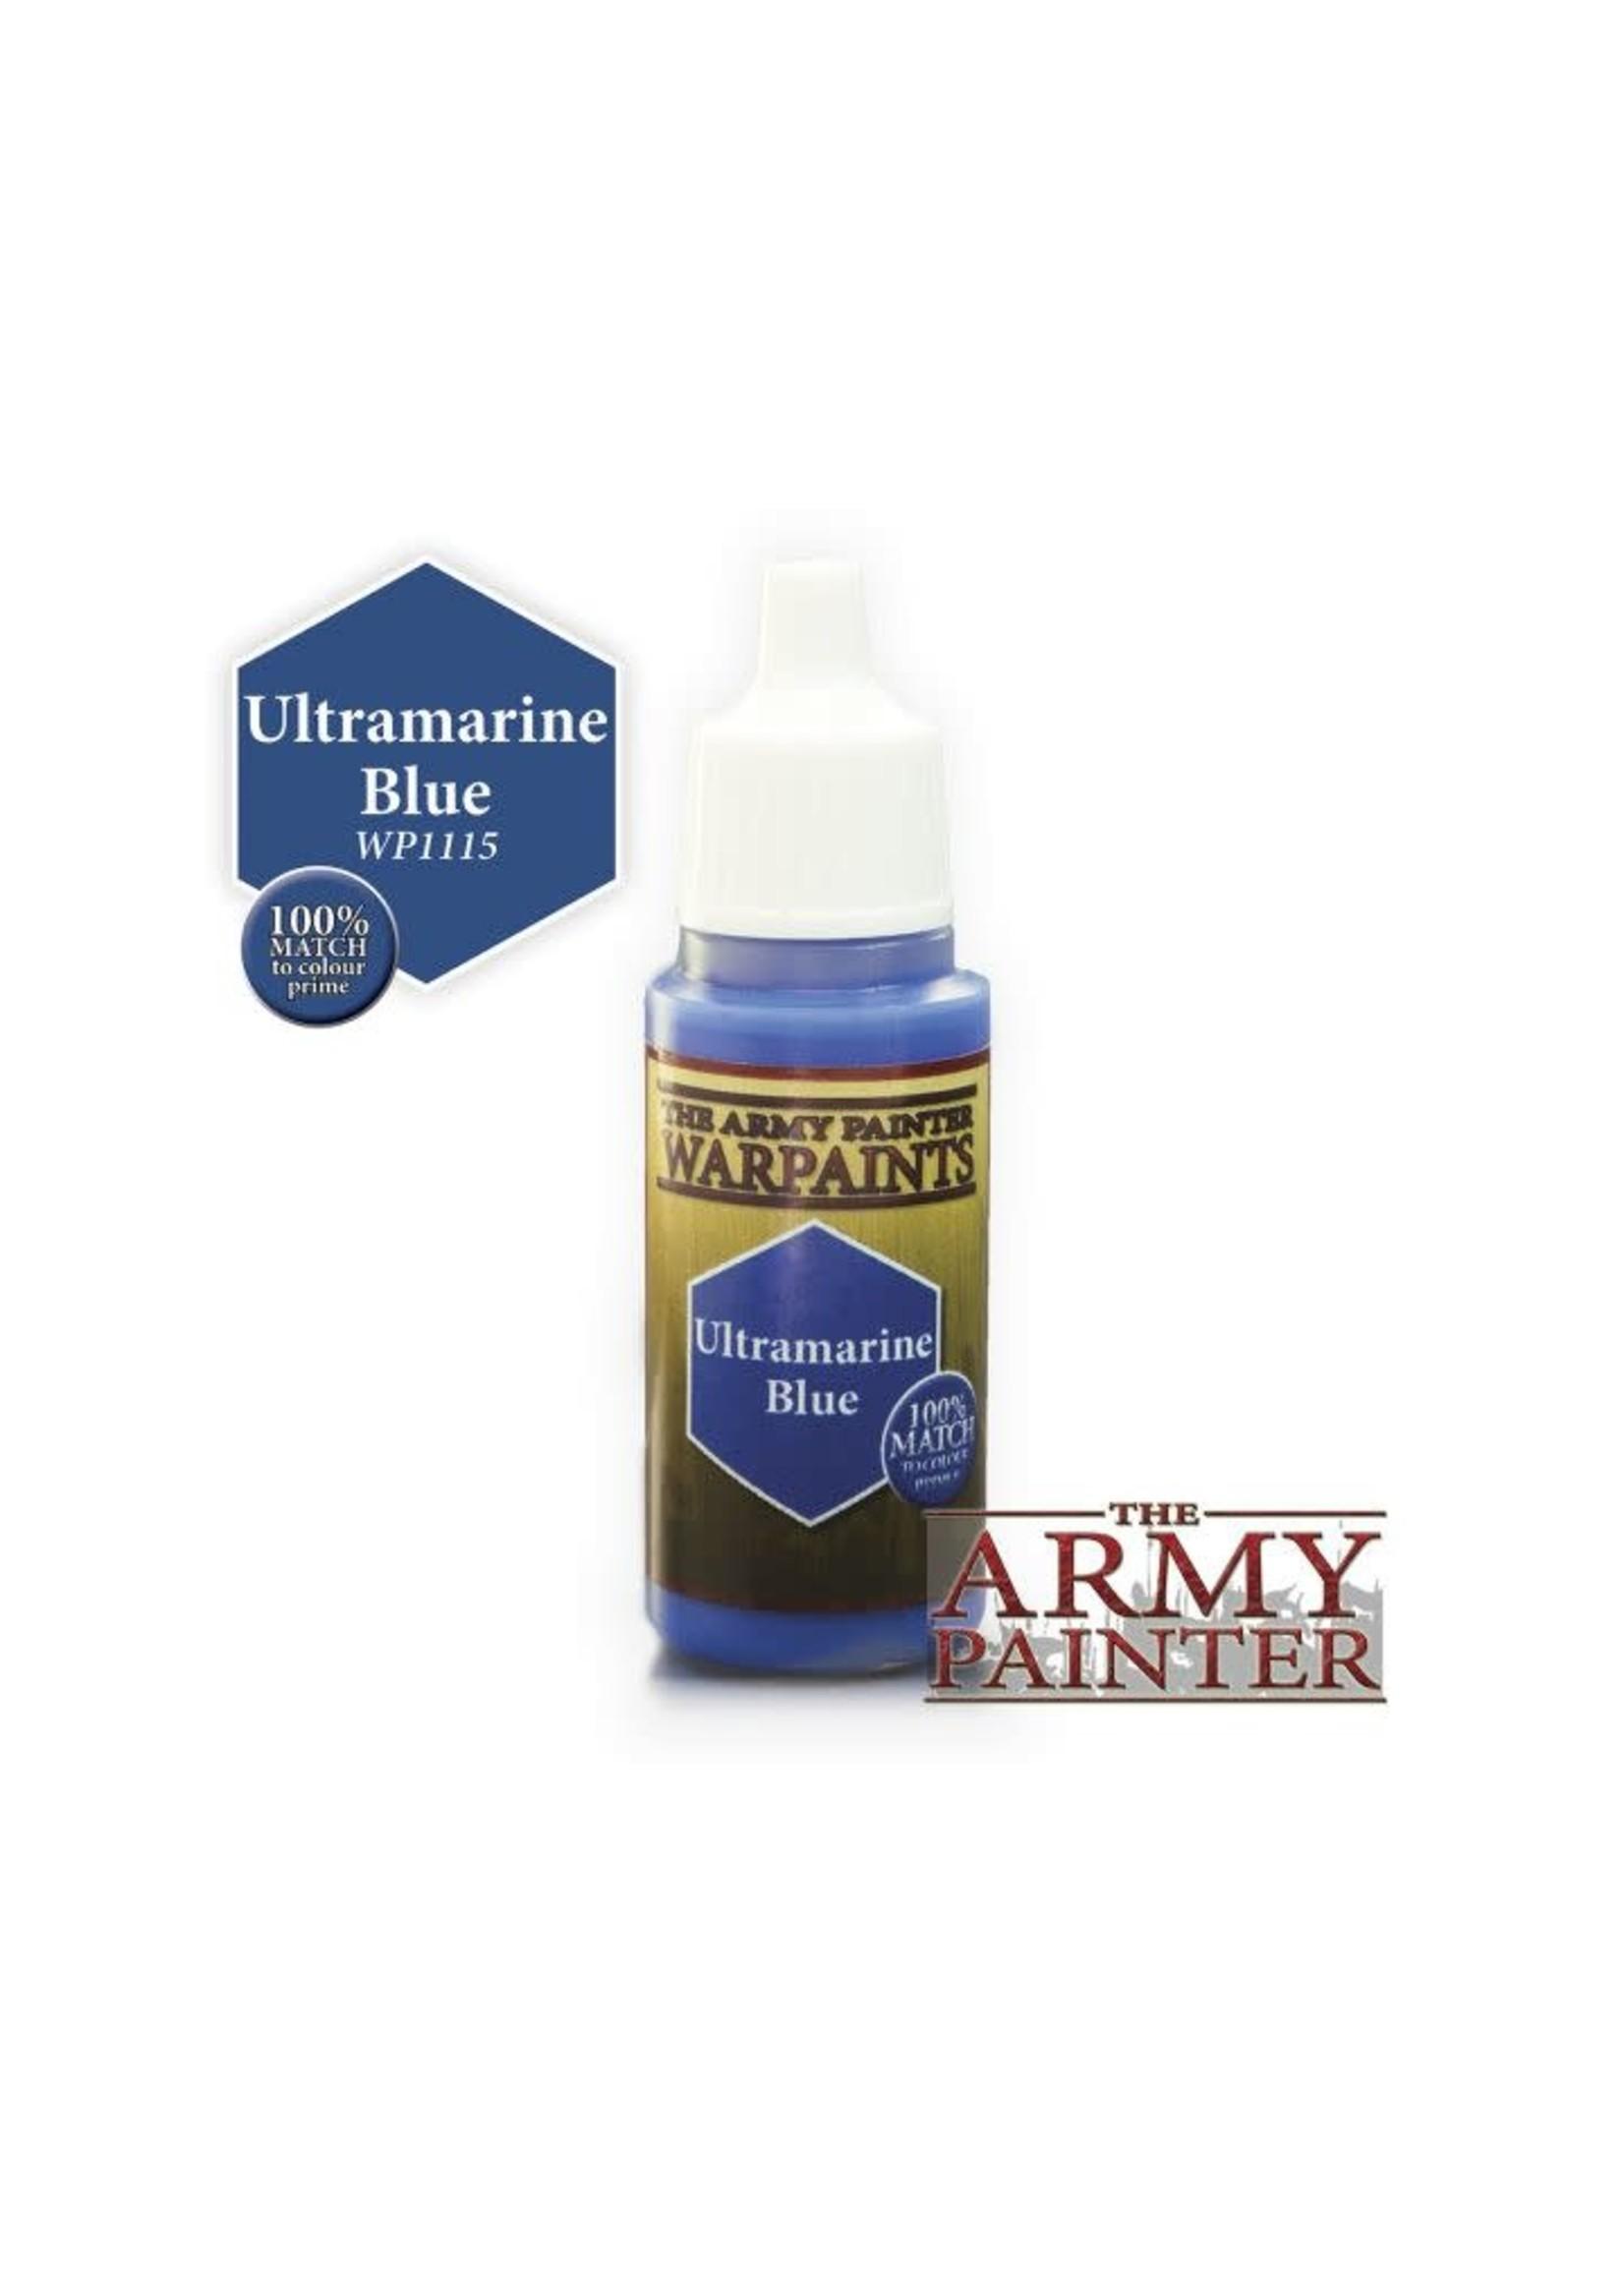 Army Painter Warpaints - Ultramarine Blue